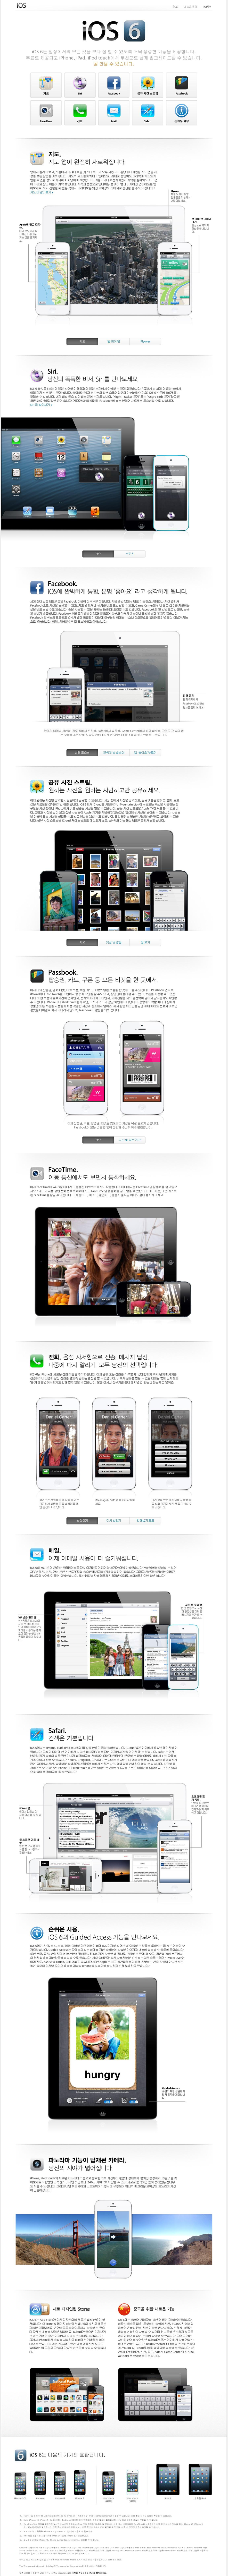 iOS6의 새로운 기능들…